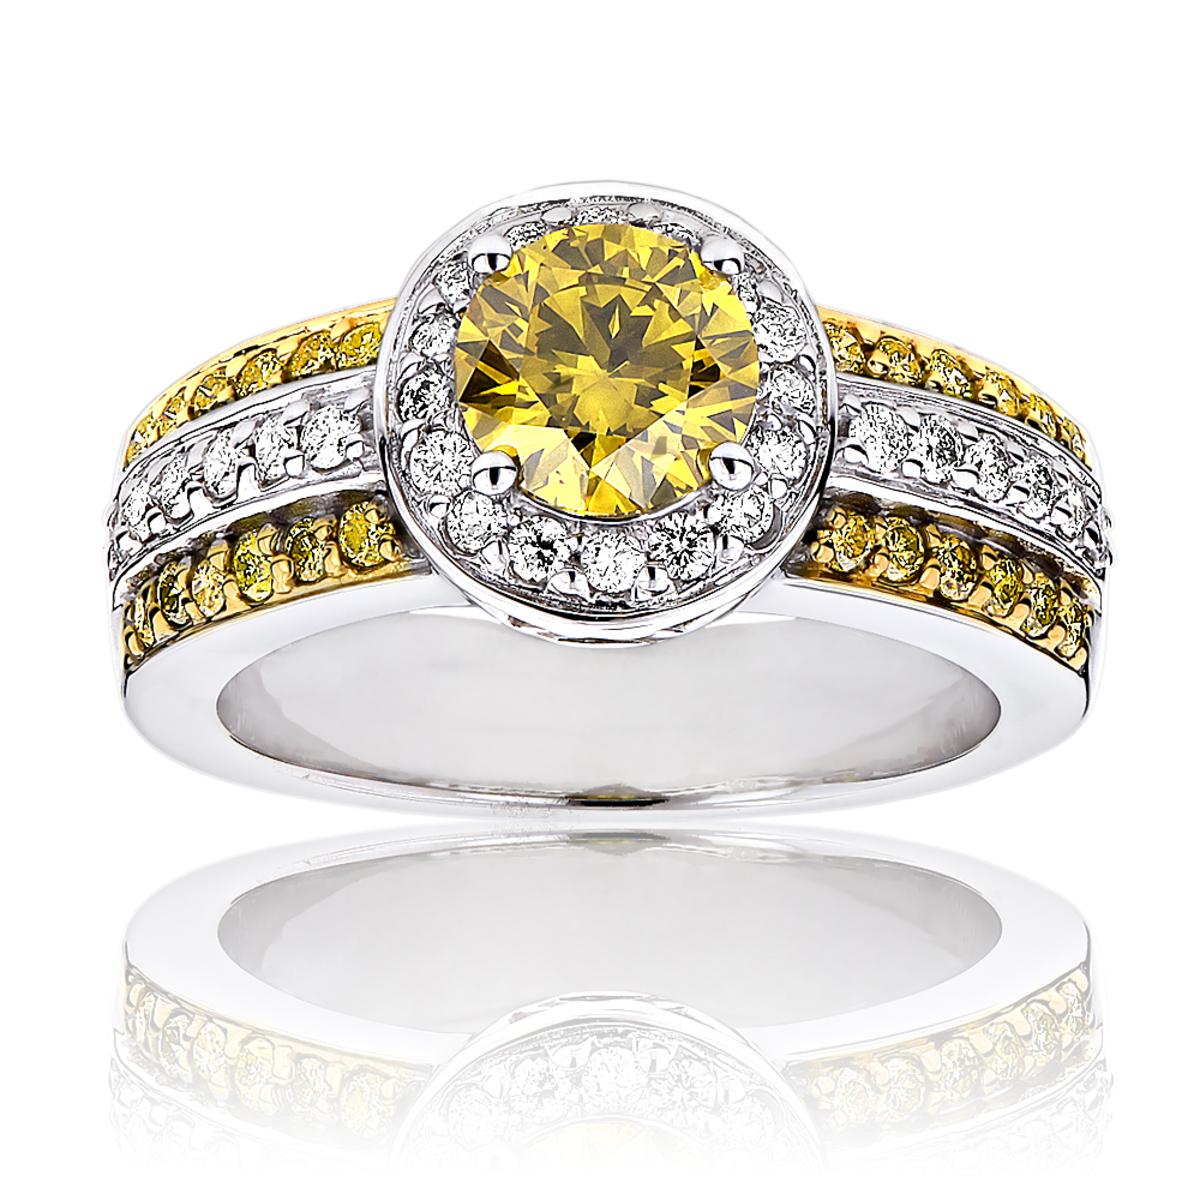 Unique White Yellow Diamond Engagement Ring Halo Design 14k Gold 1.65ct